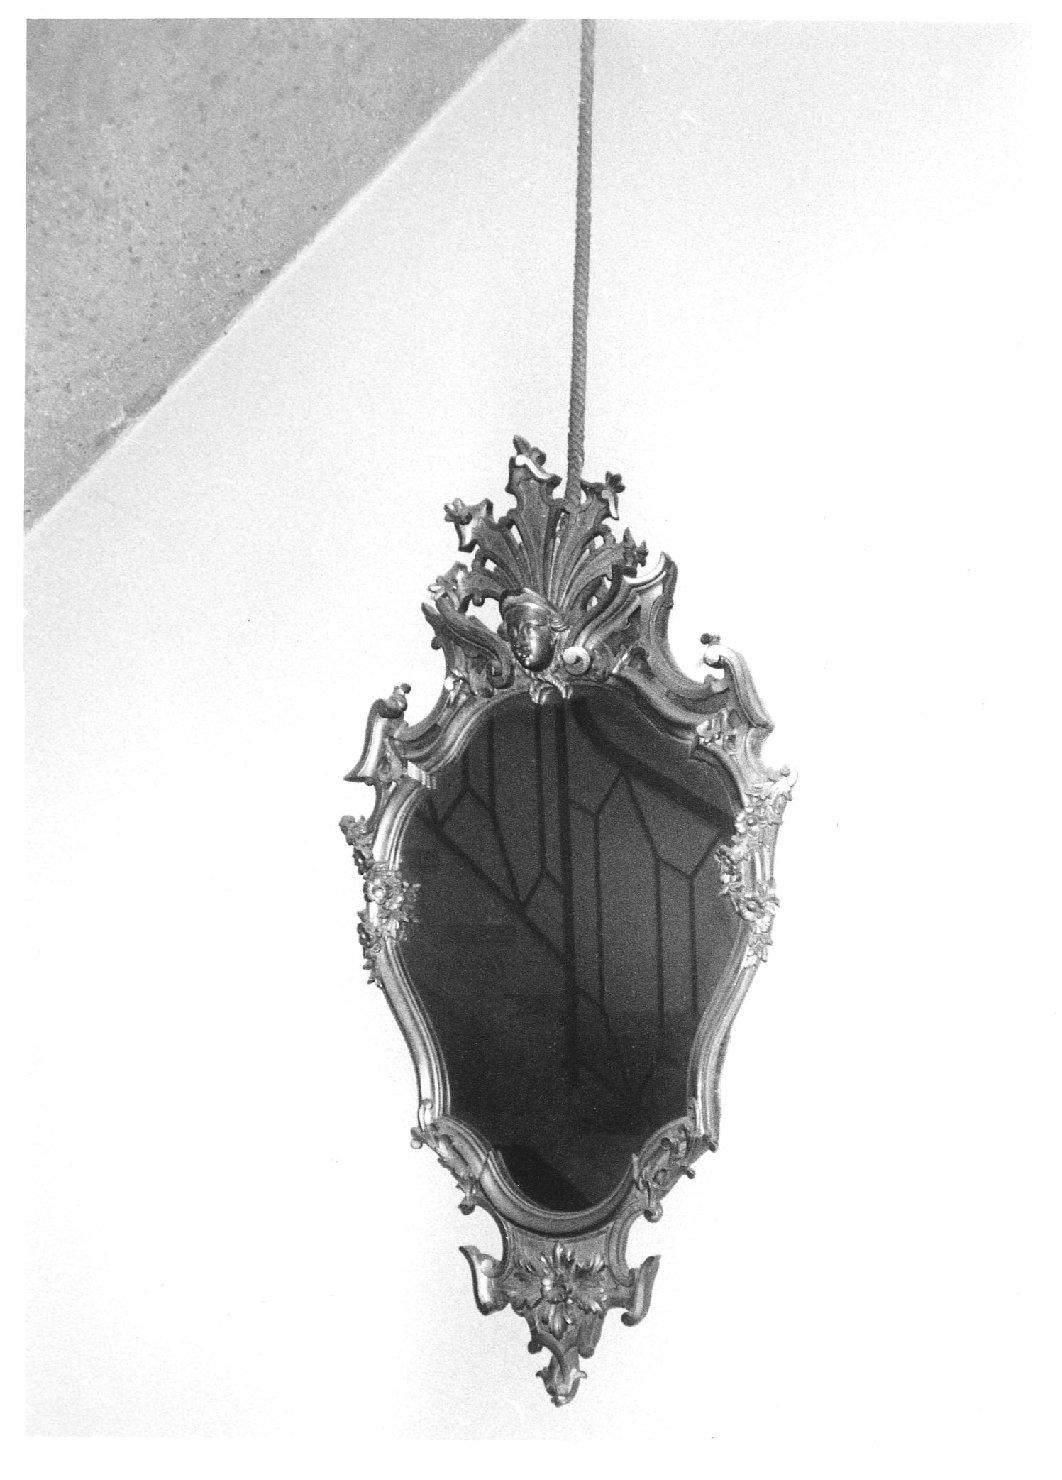 specchiera, opera isolata - manifattura veneziana (sec. XIX)